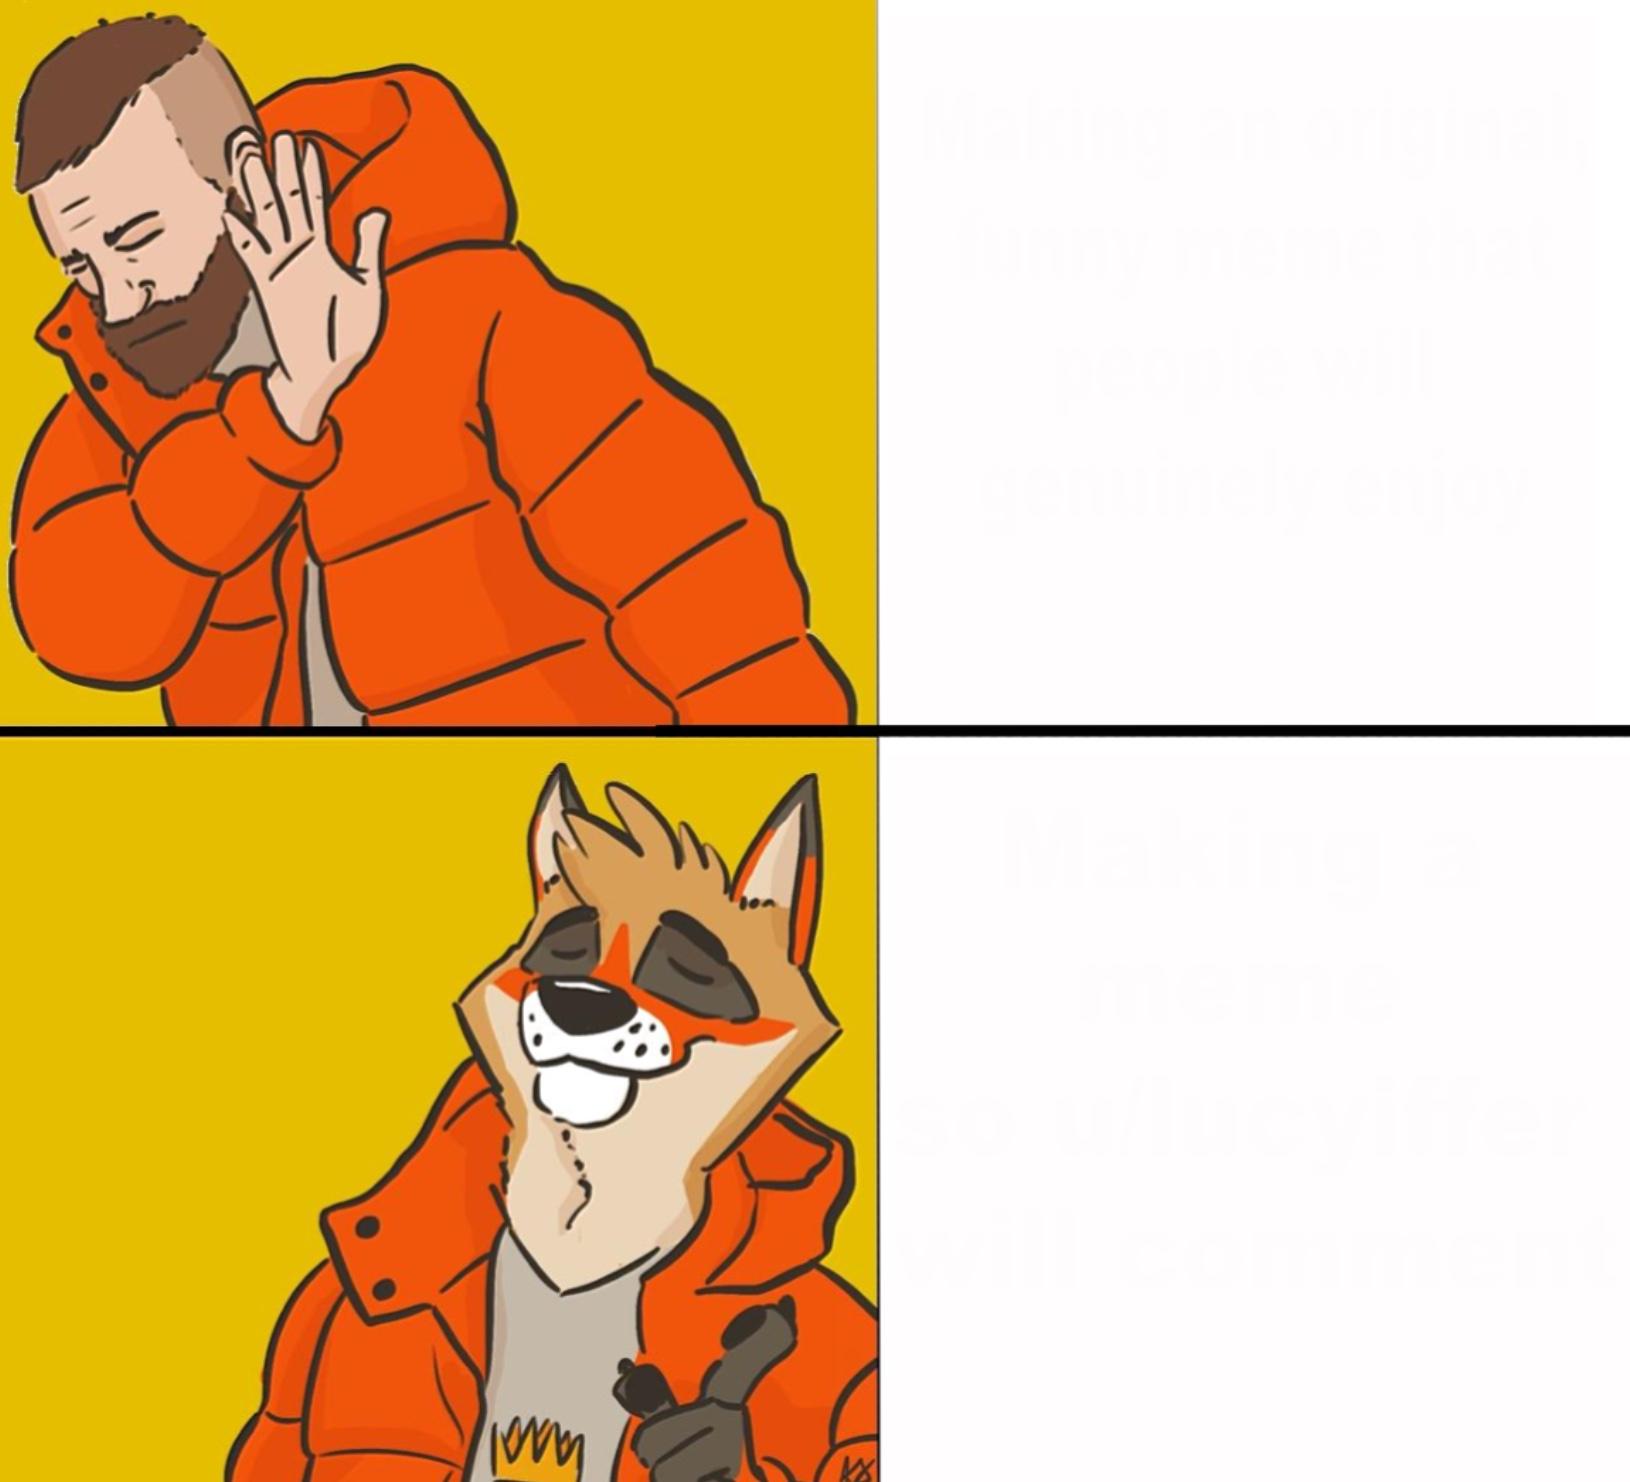 Furry Drake Meme Generator - Imgflip